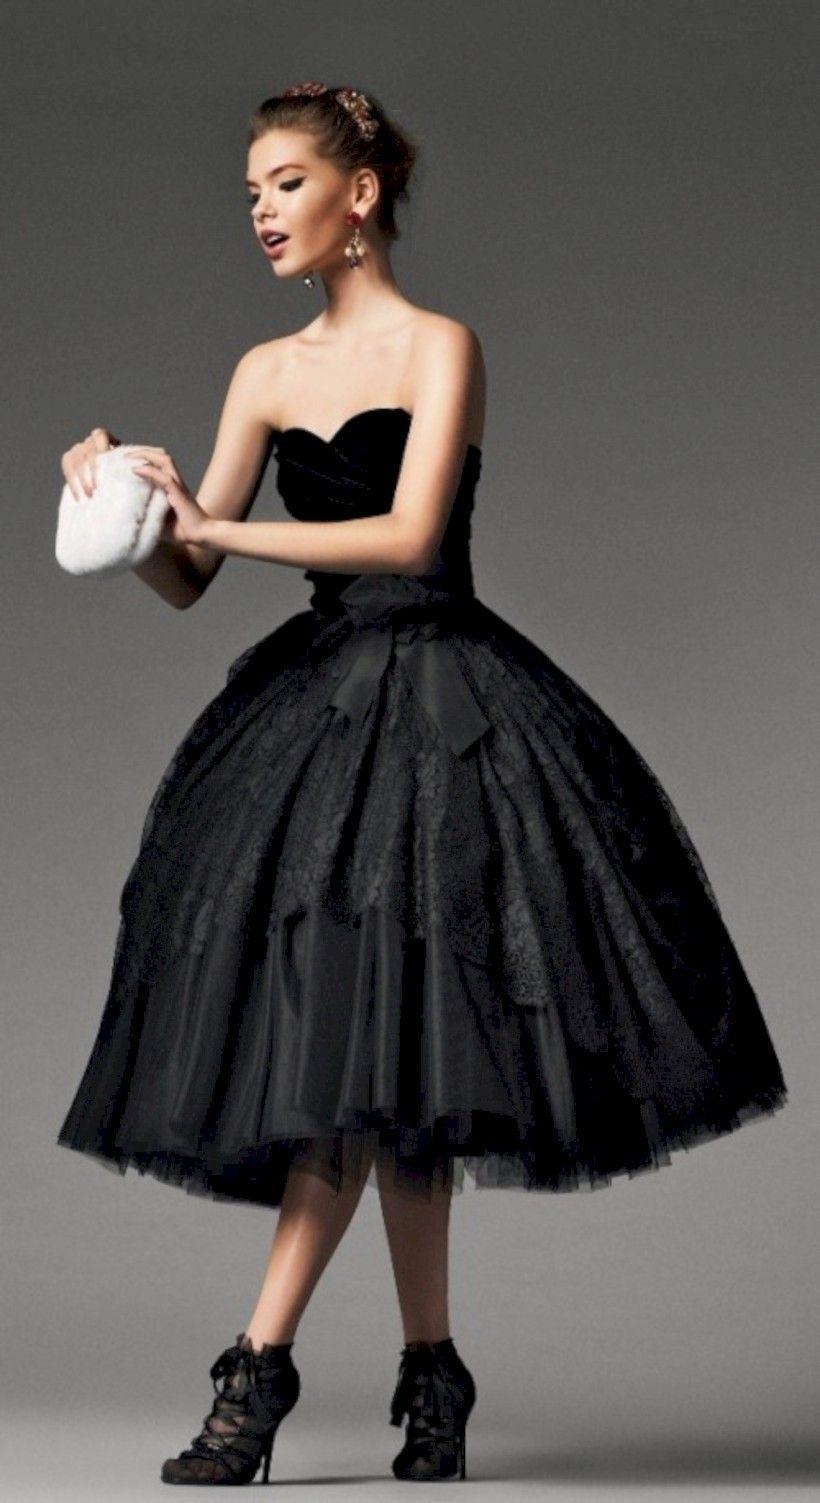 Nice classy halloween wedding dress ideas to makes you look